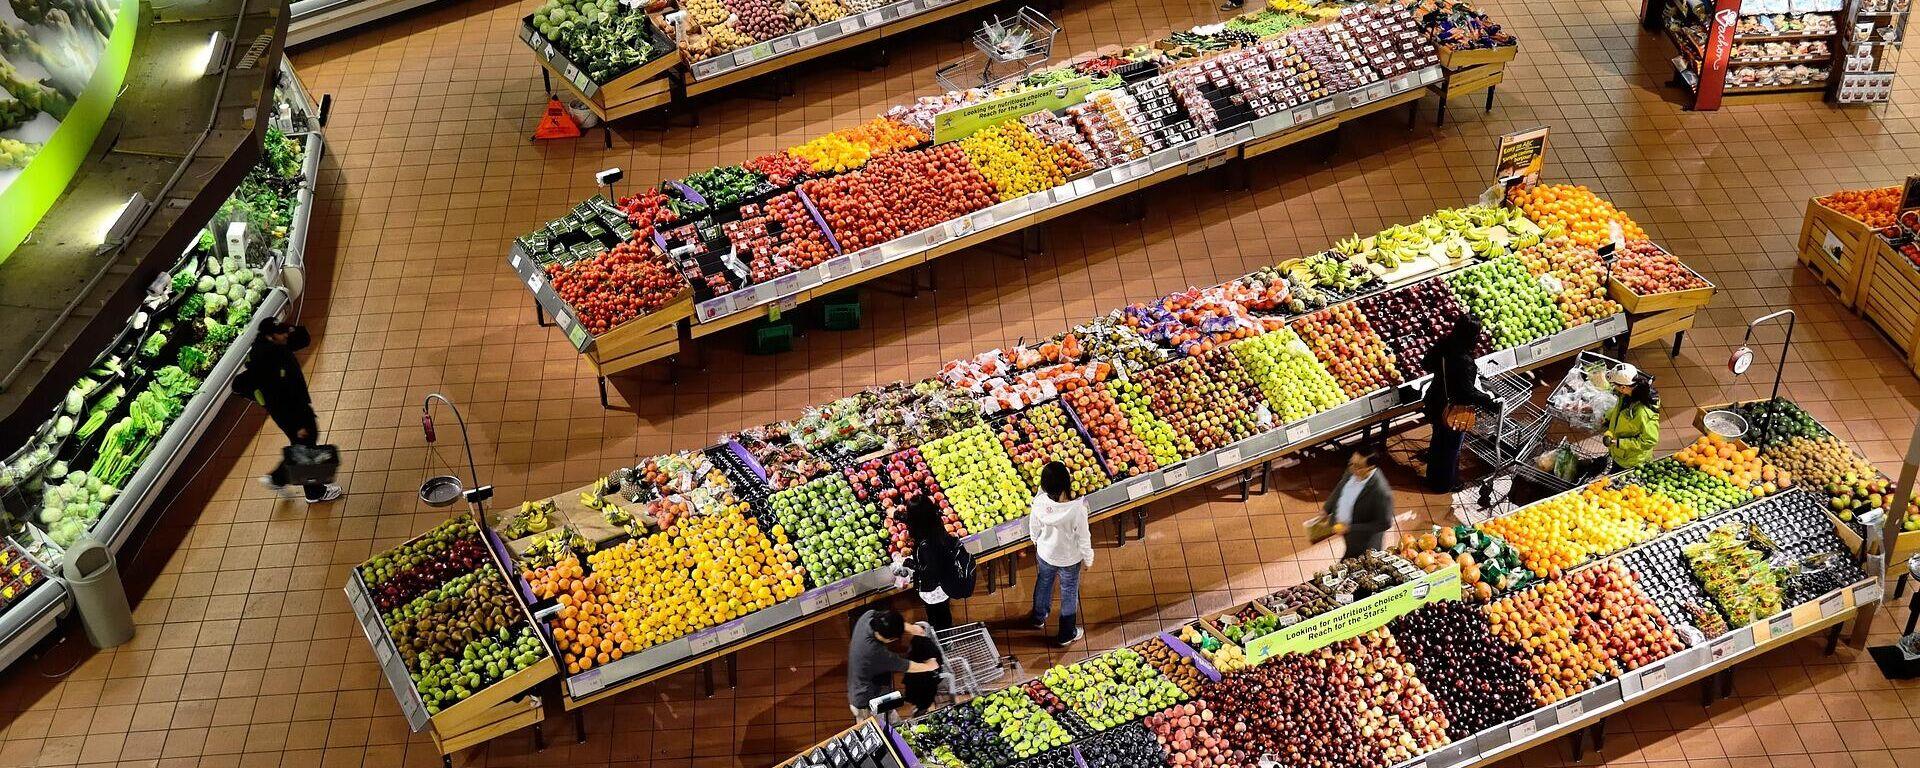 Supermarkt (Symbolbild) - SNA, 1920, 22.09.2021